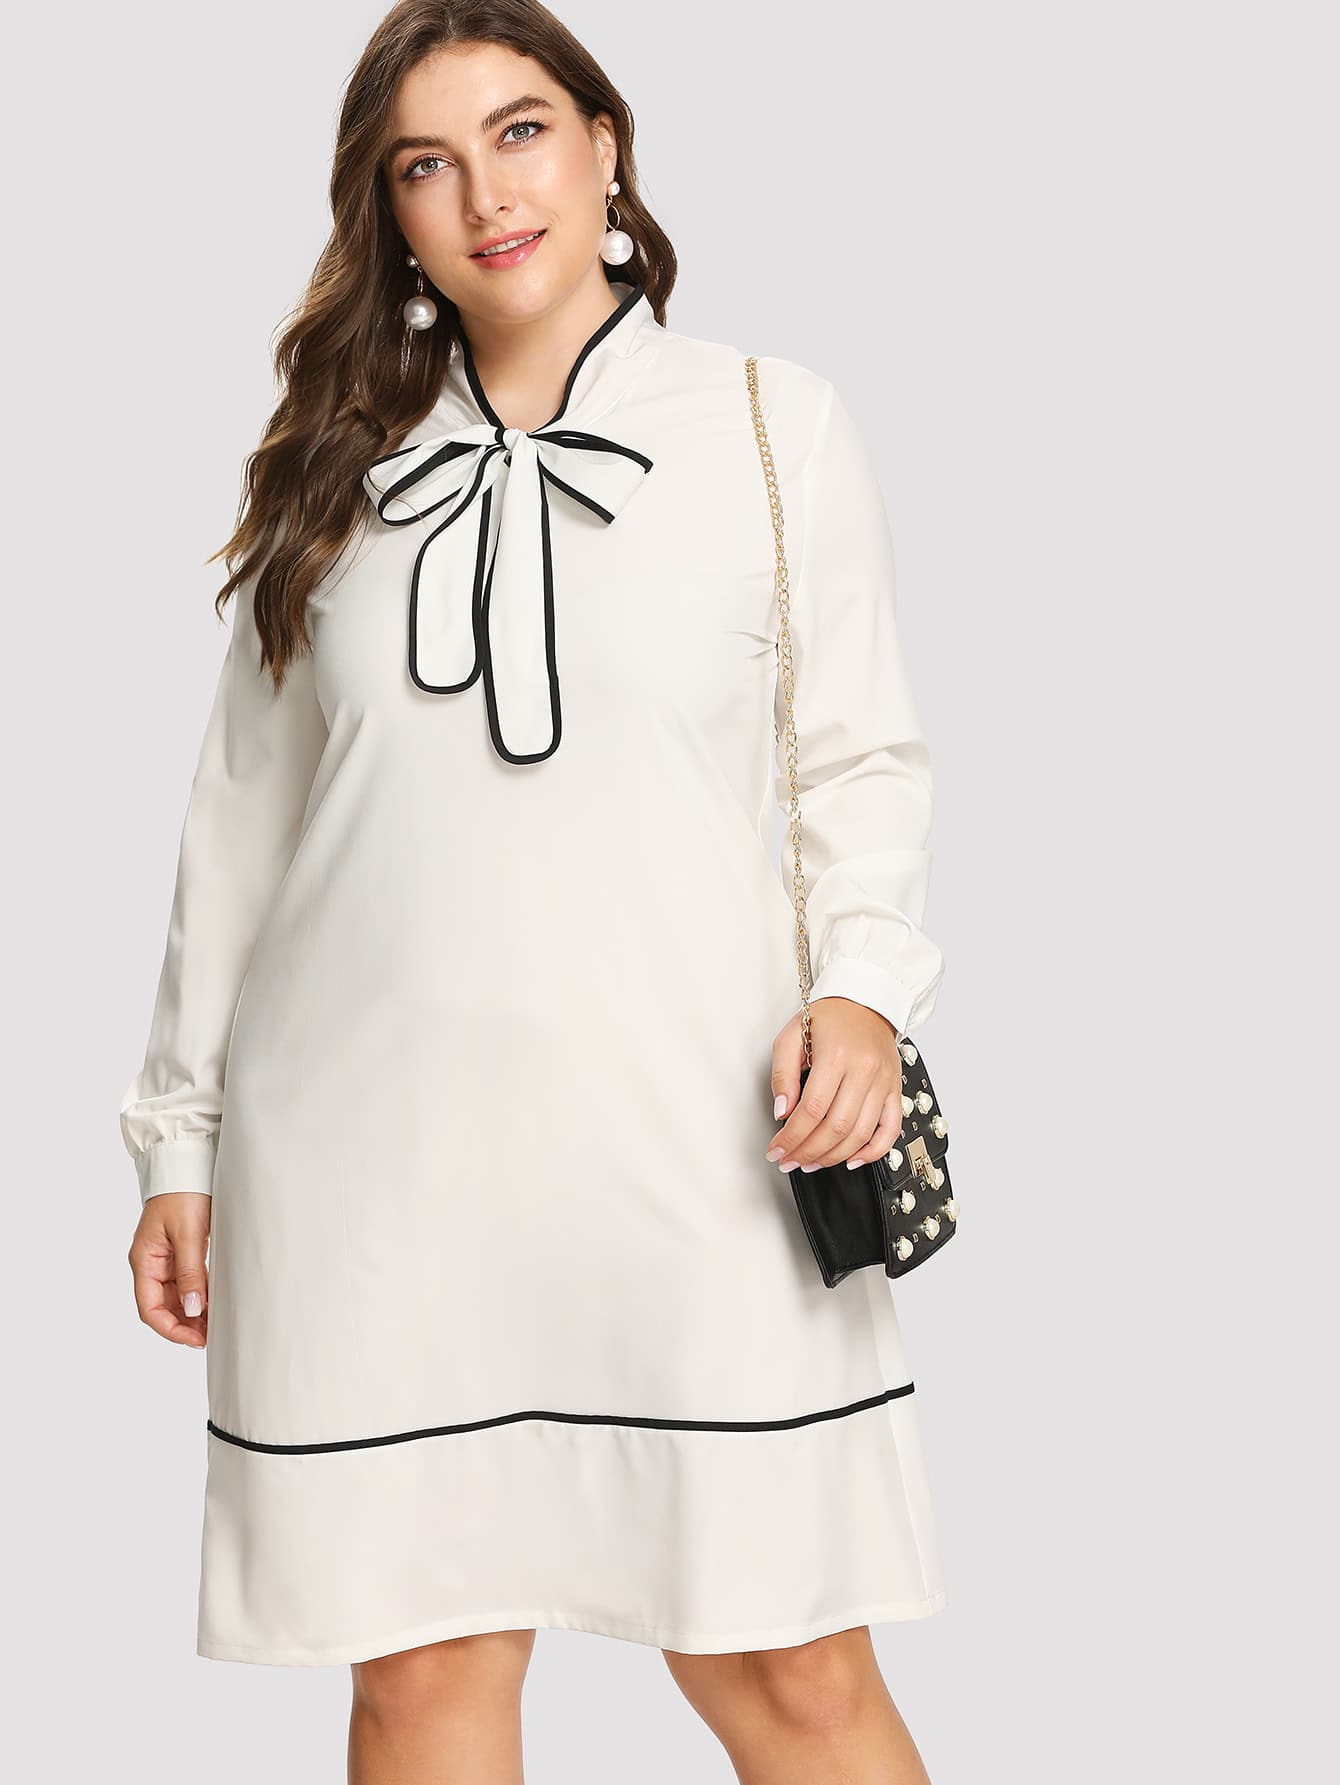 Contrast Binding Tie Neck Tunic Dress contrast tie neck faux pocket tweed dress